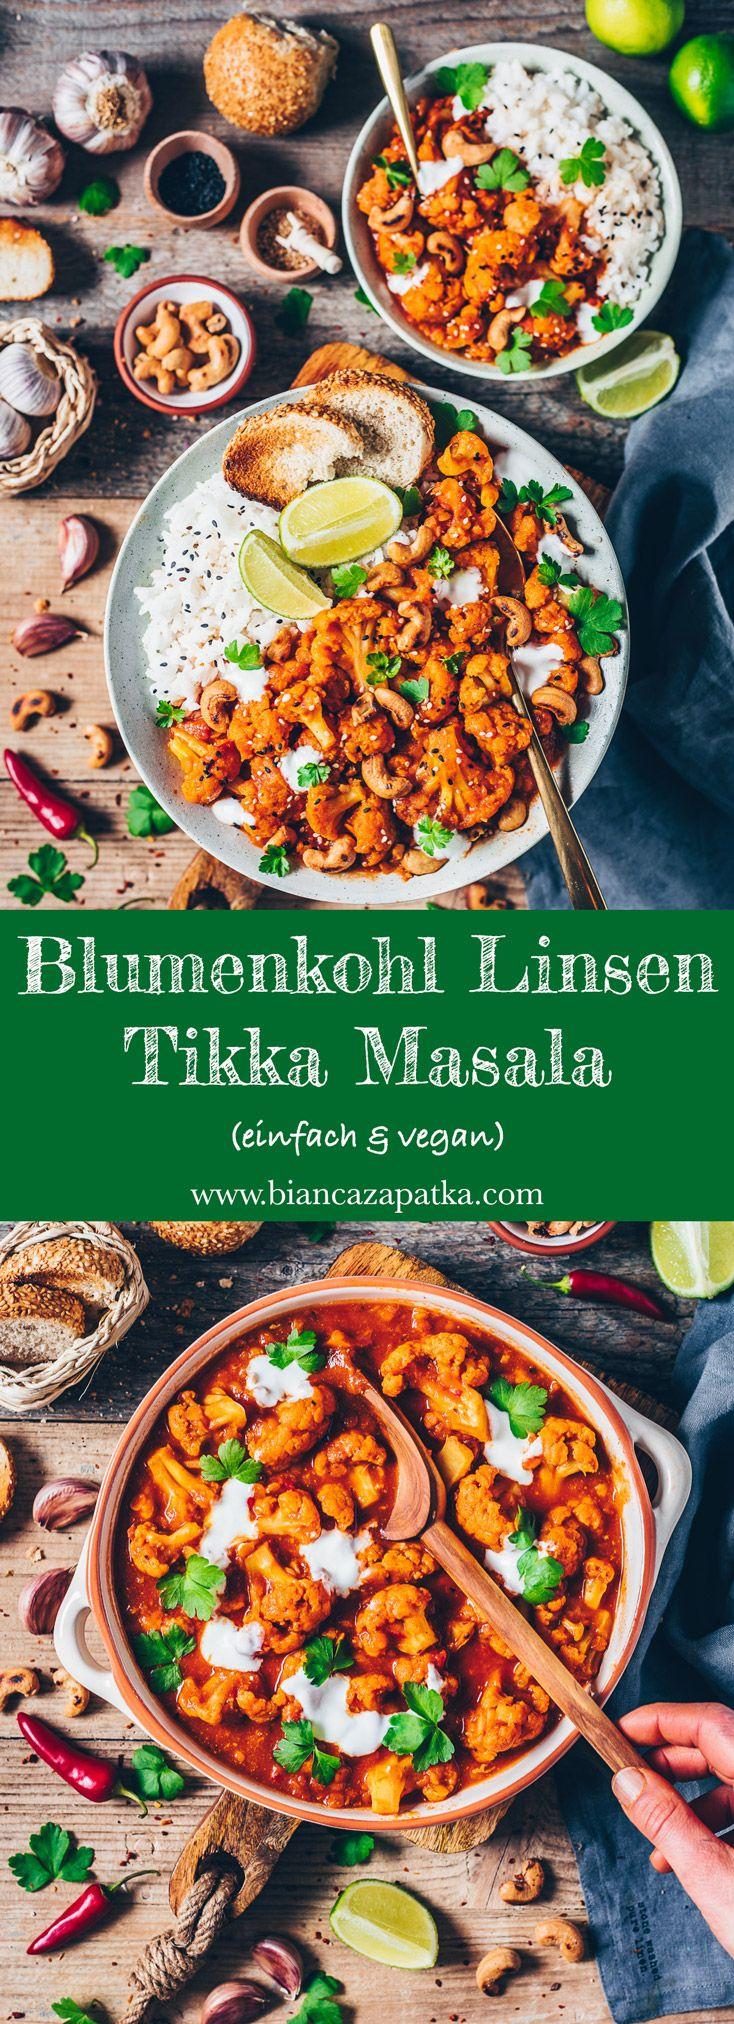 Blumenkohl Tikka Masala Curry (einfach & vegan)